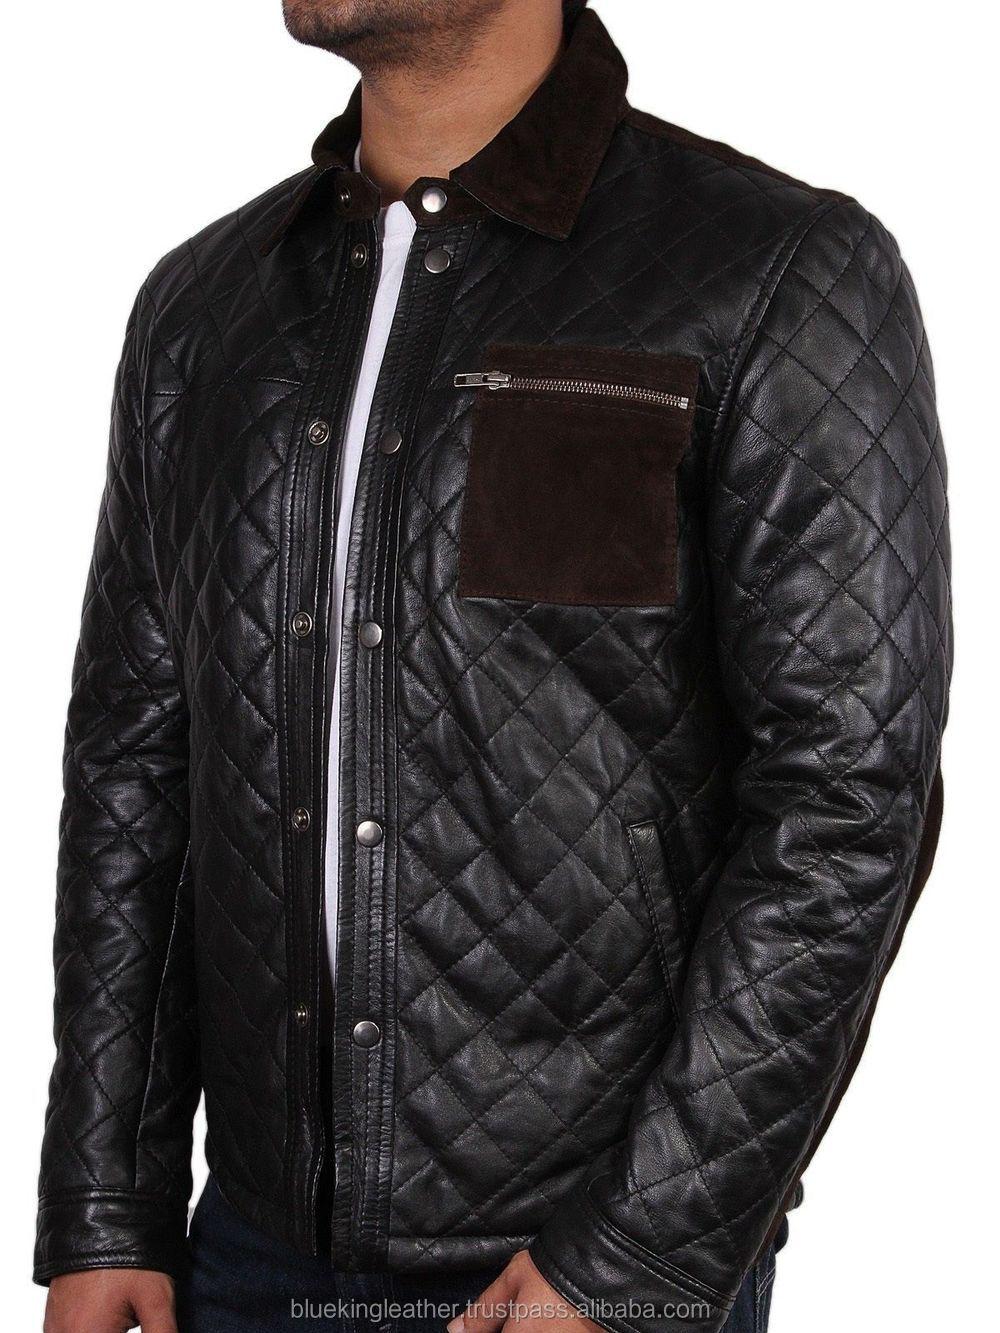 Men Leather Jacket Brand New 100% Genuine Soft Pakistan Lambskin ... : leather quilted jacket men - Adamdwight.com